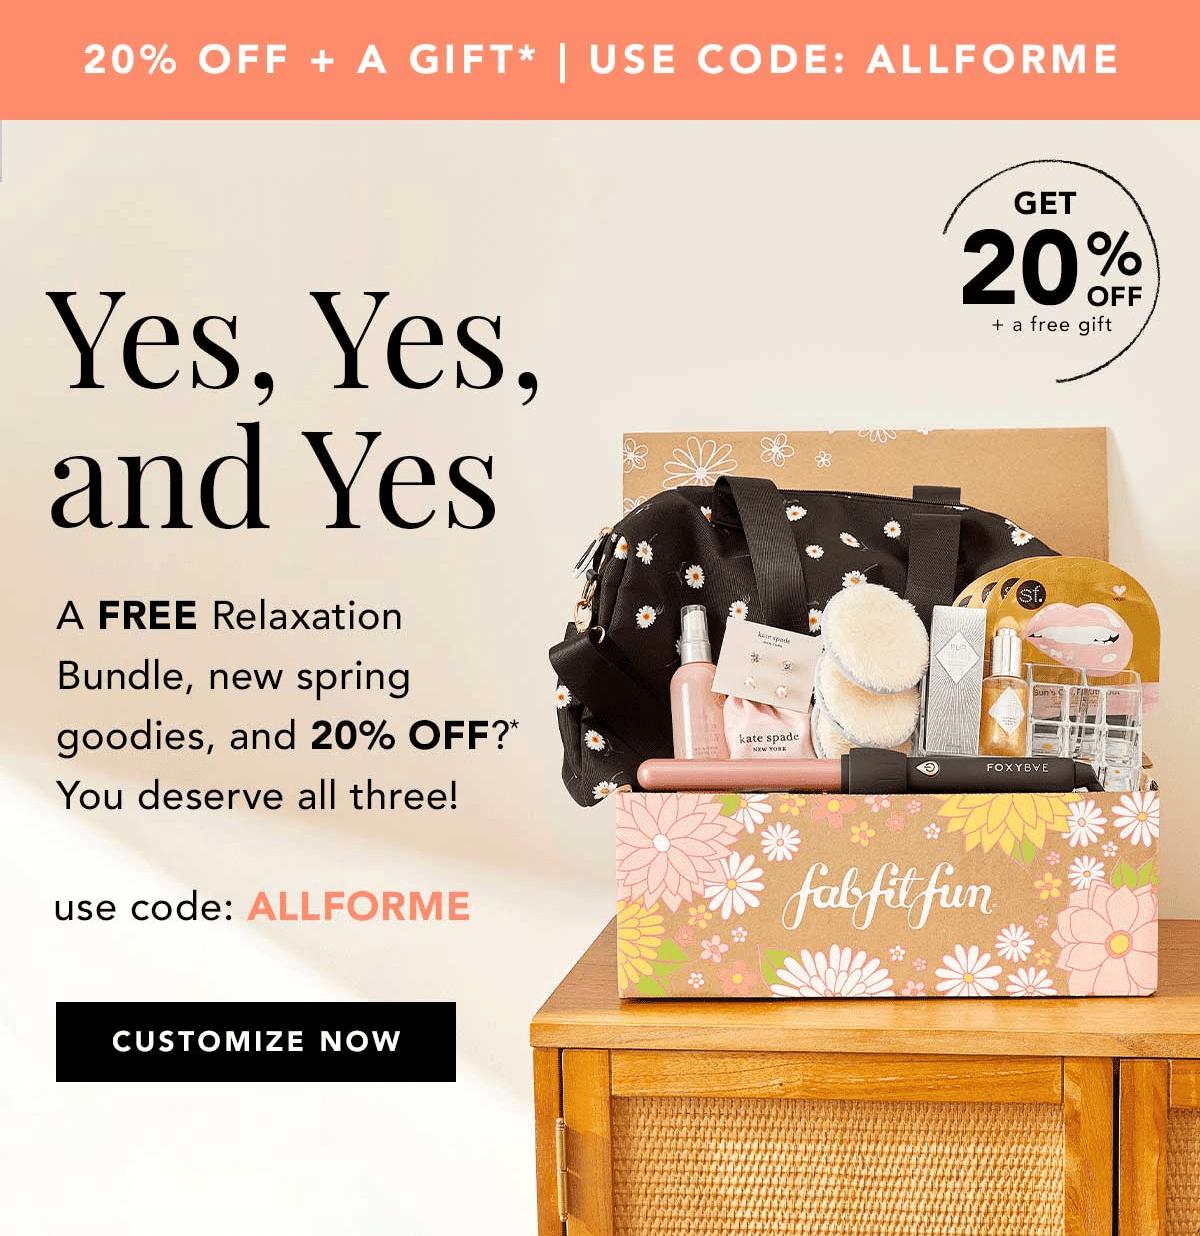 FabFitFun Coupon Code – 20% Off + Free Relaxation Bundle